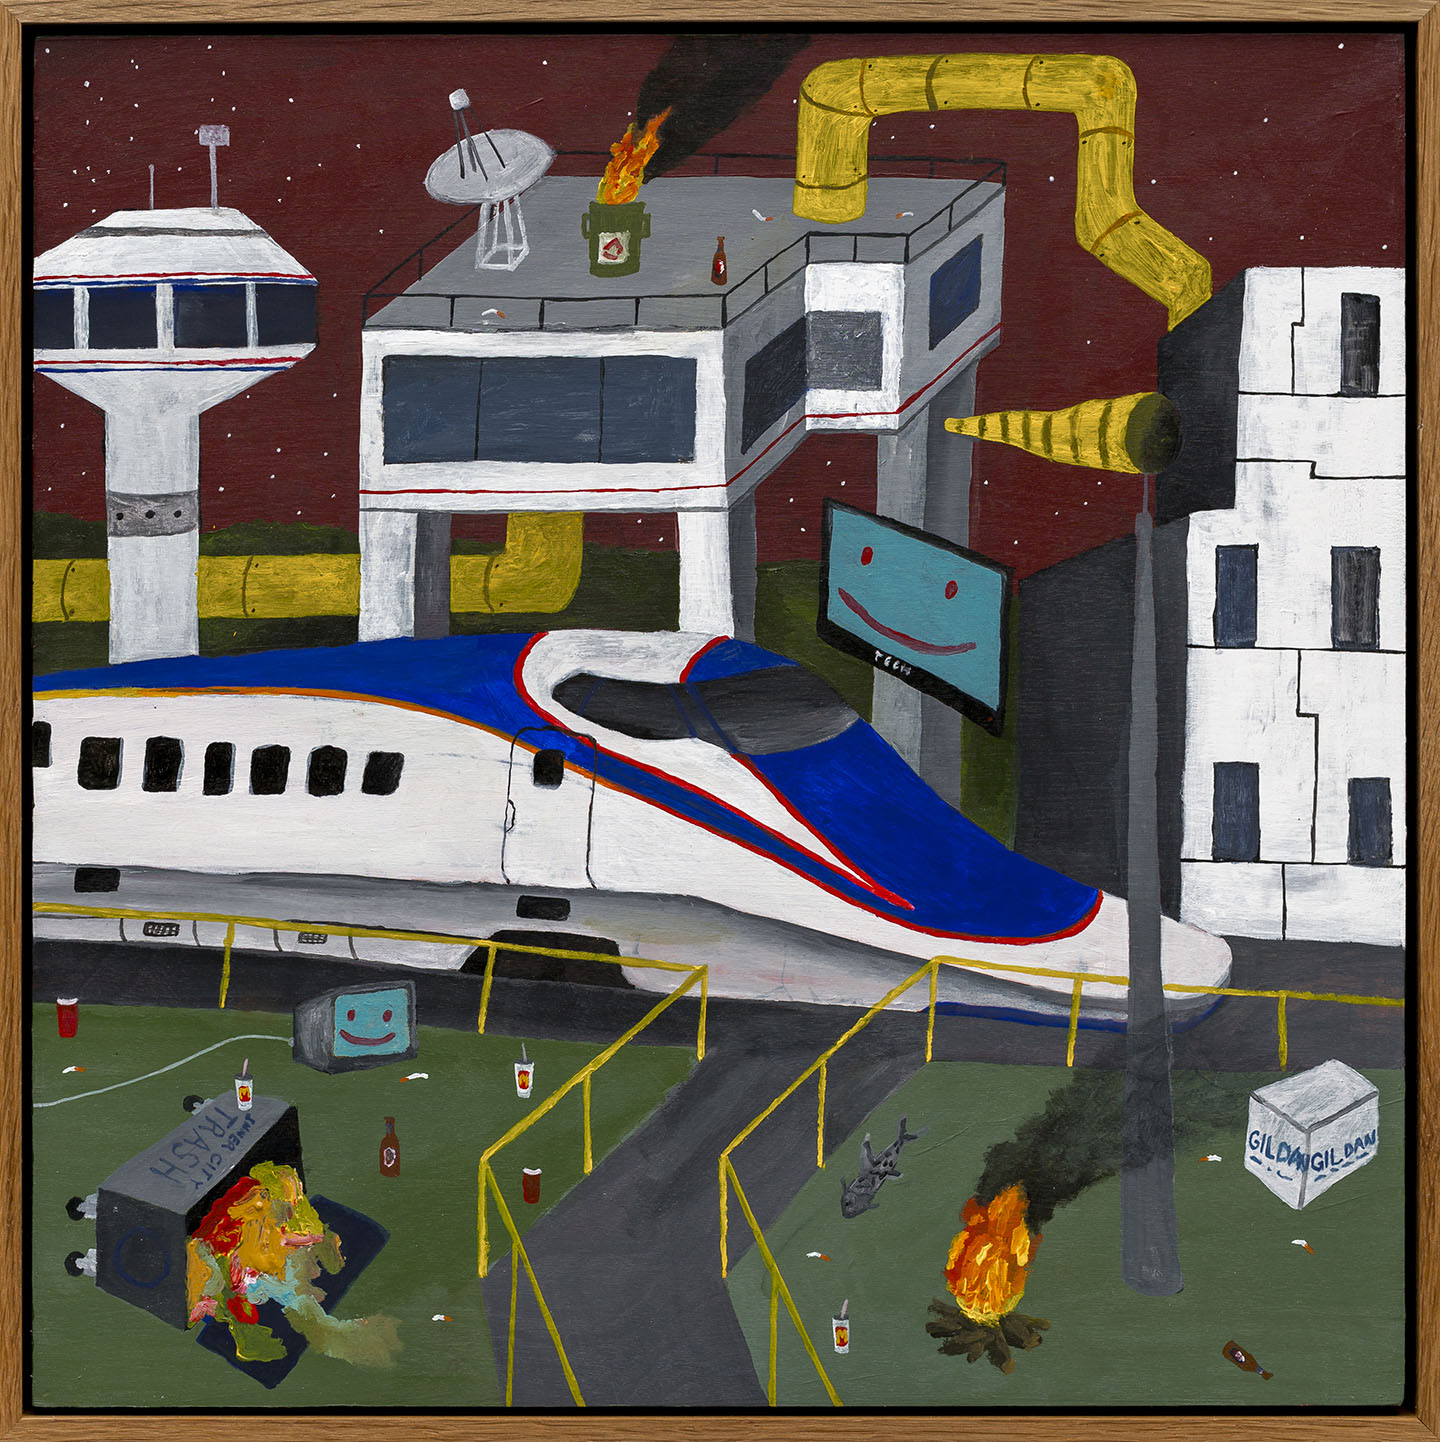 Futalitarian Metropolis